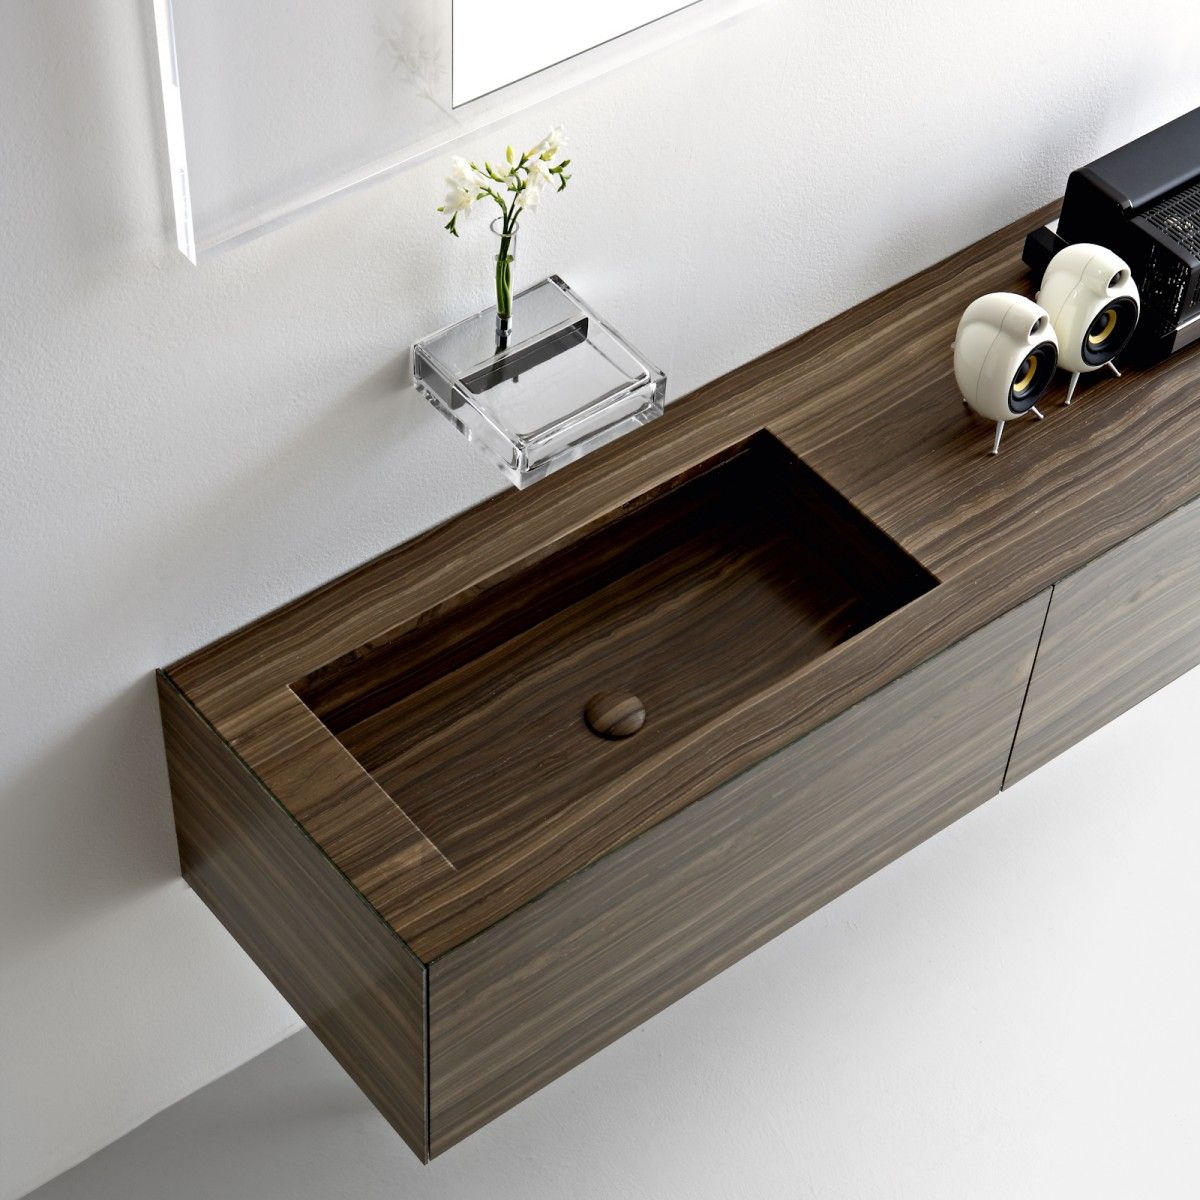 3-Wooden-basin.jpg (1200×1200)